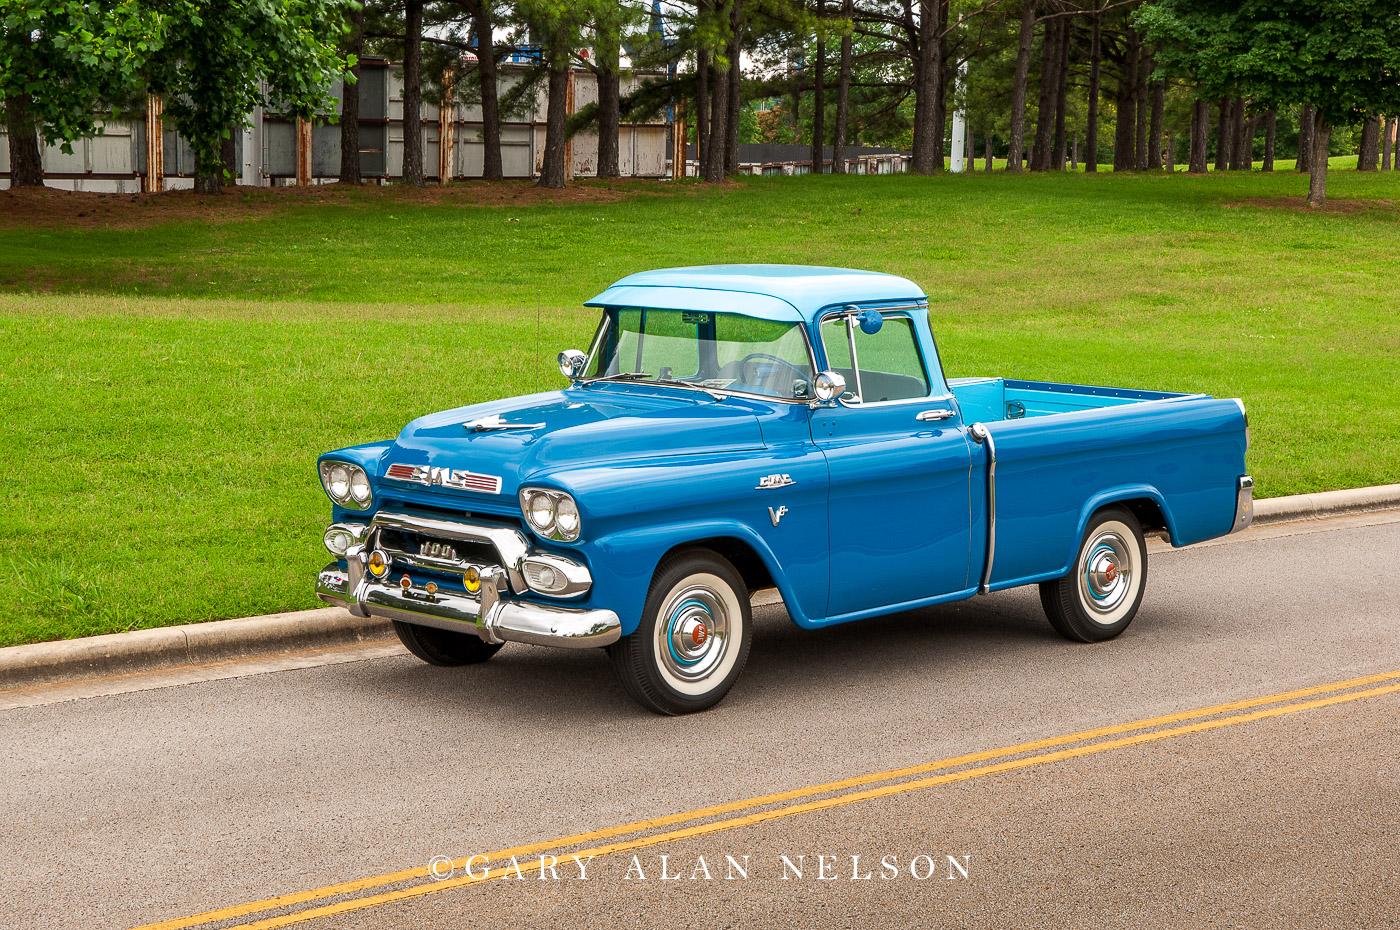 1959 GMC Suburban Pickup